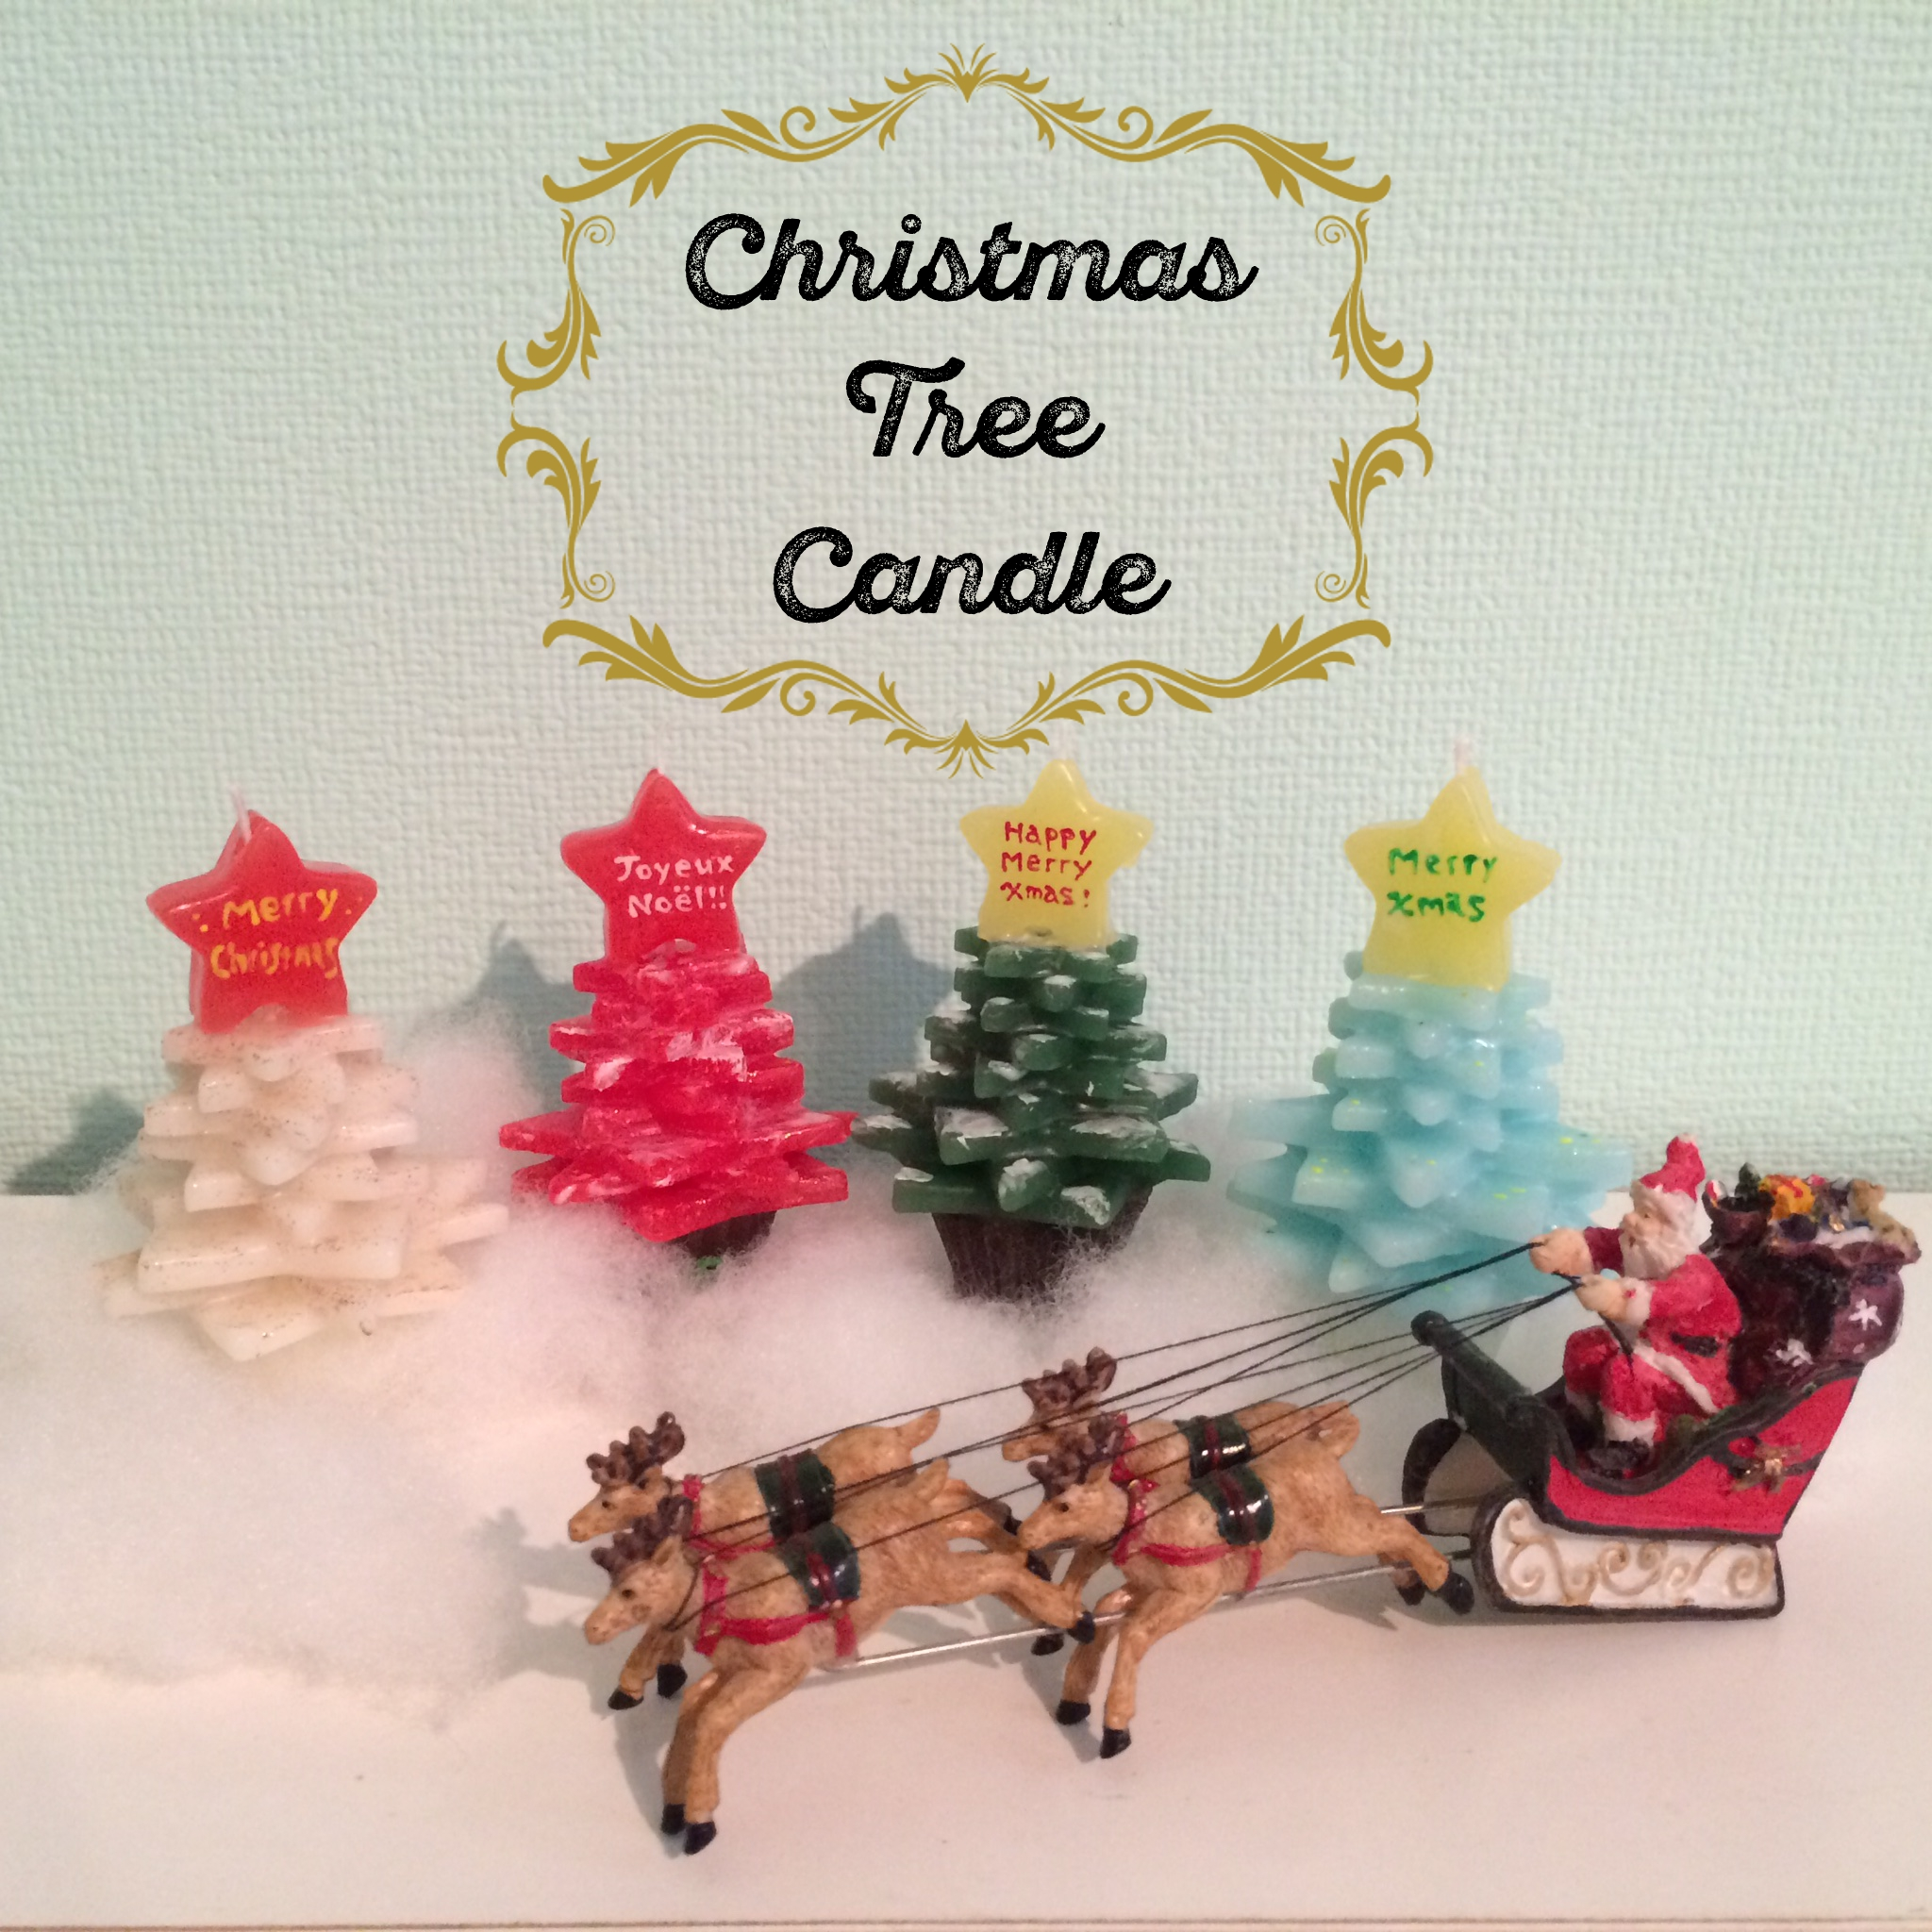 c-tree-candle